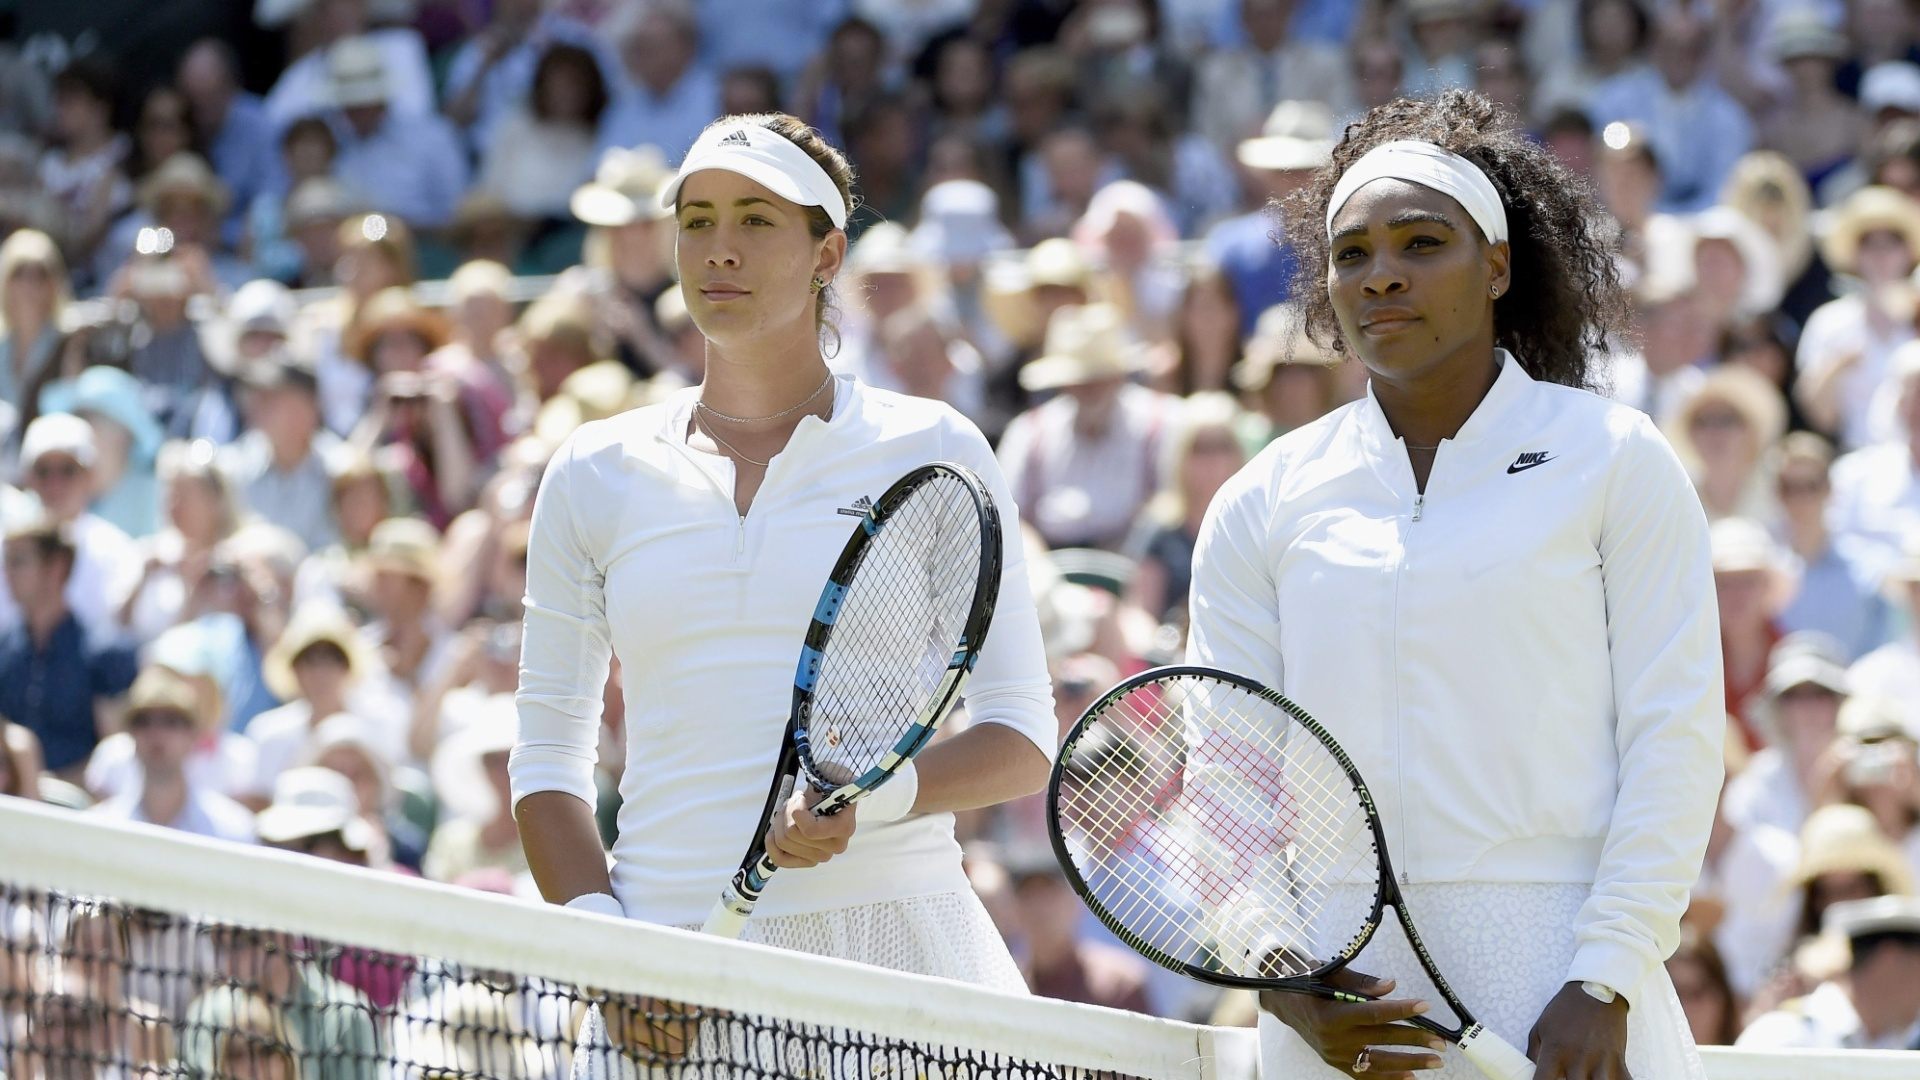 f2dd5d41261 Serena Williams e Garbiñe Muguruza na final de Wimbledon